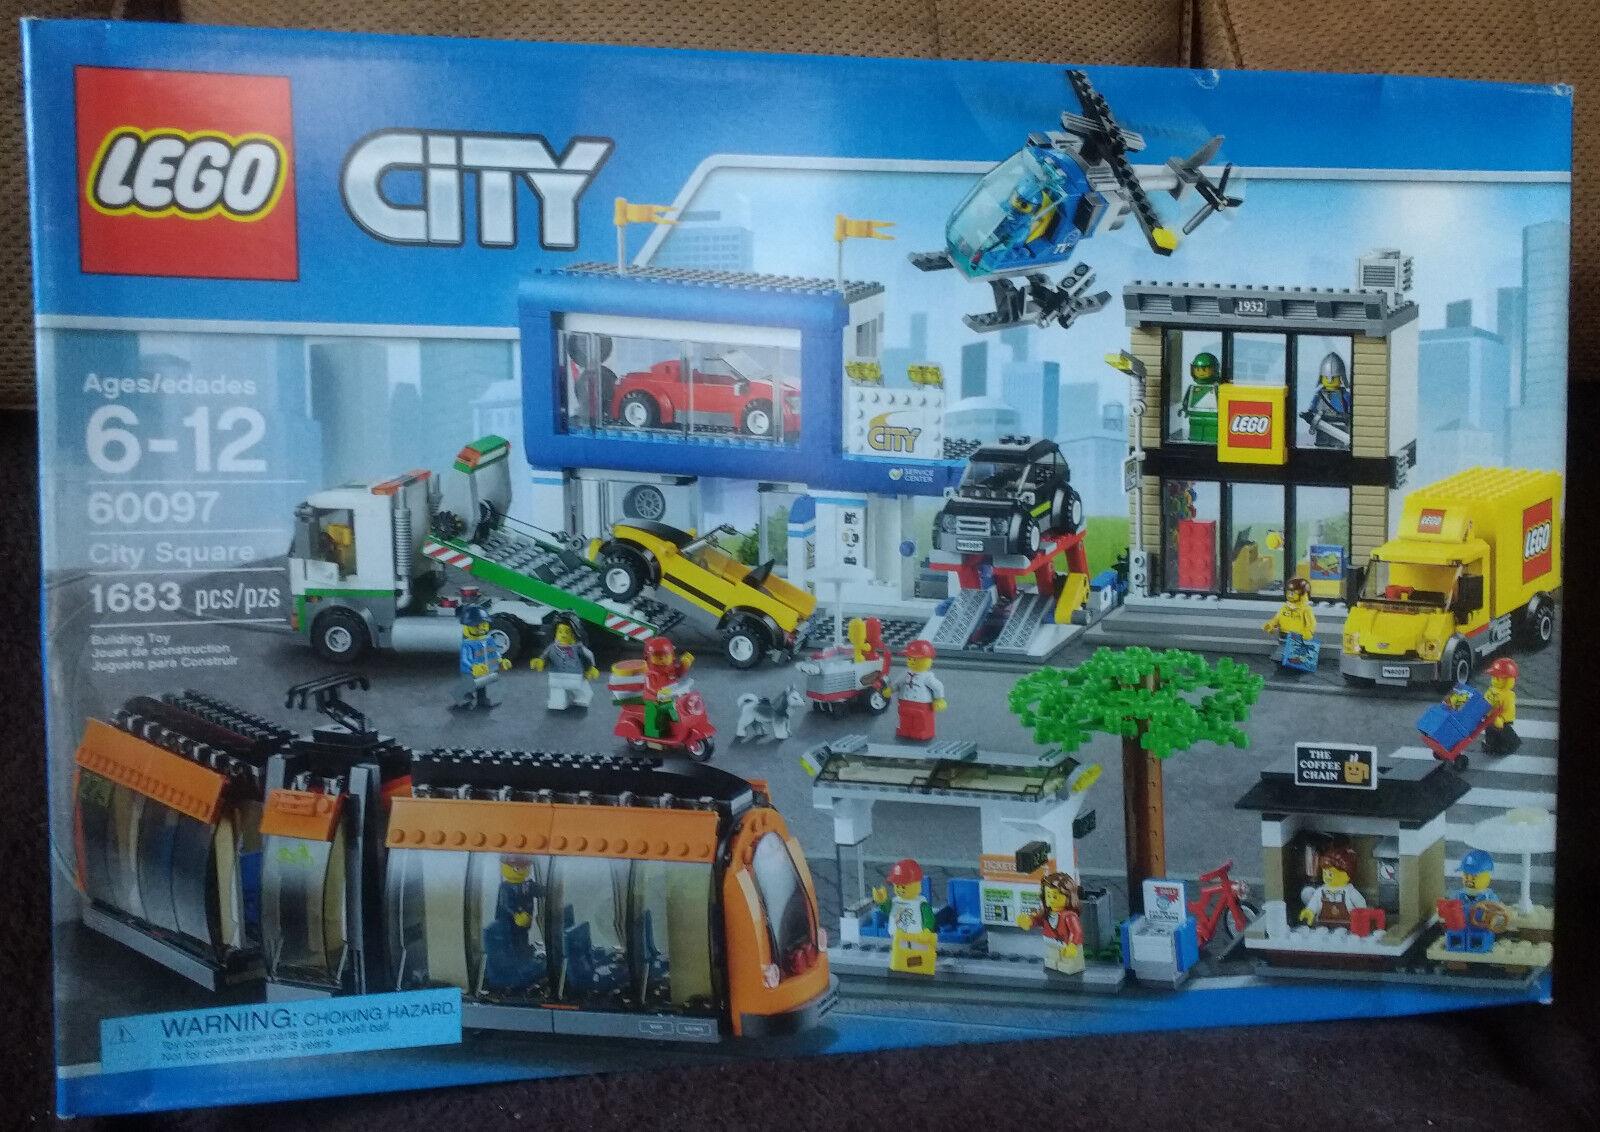 LEGO City Square (60097) NEW MISB